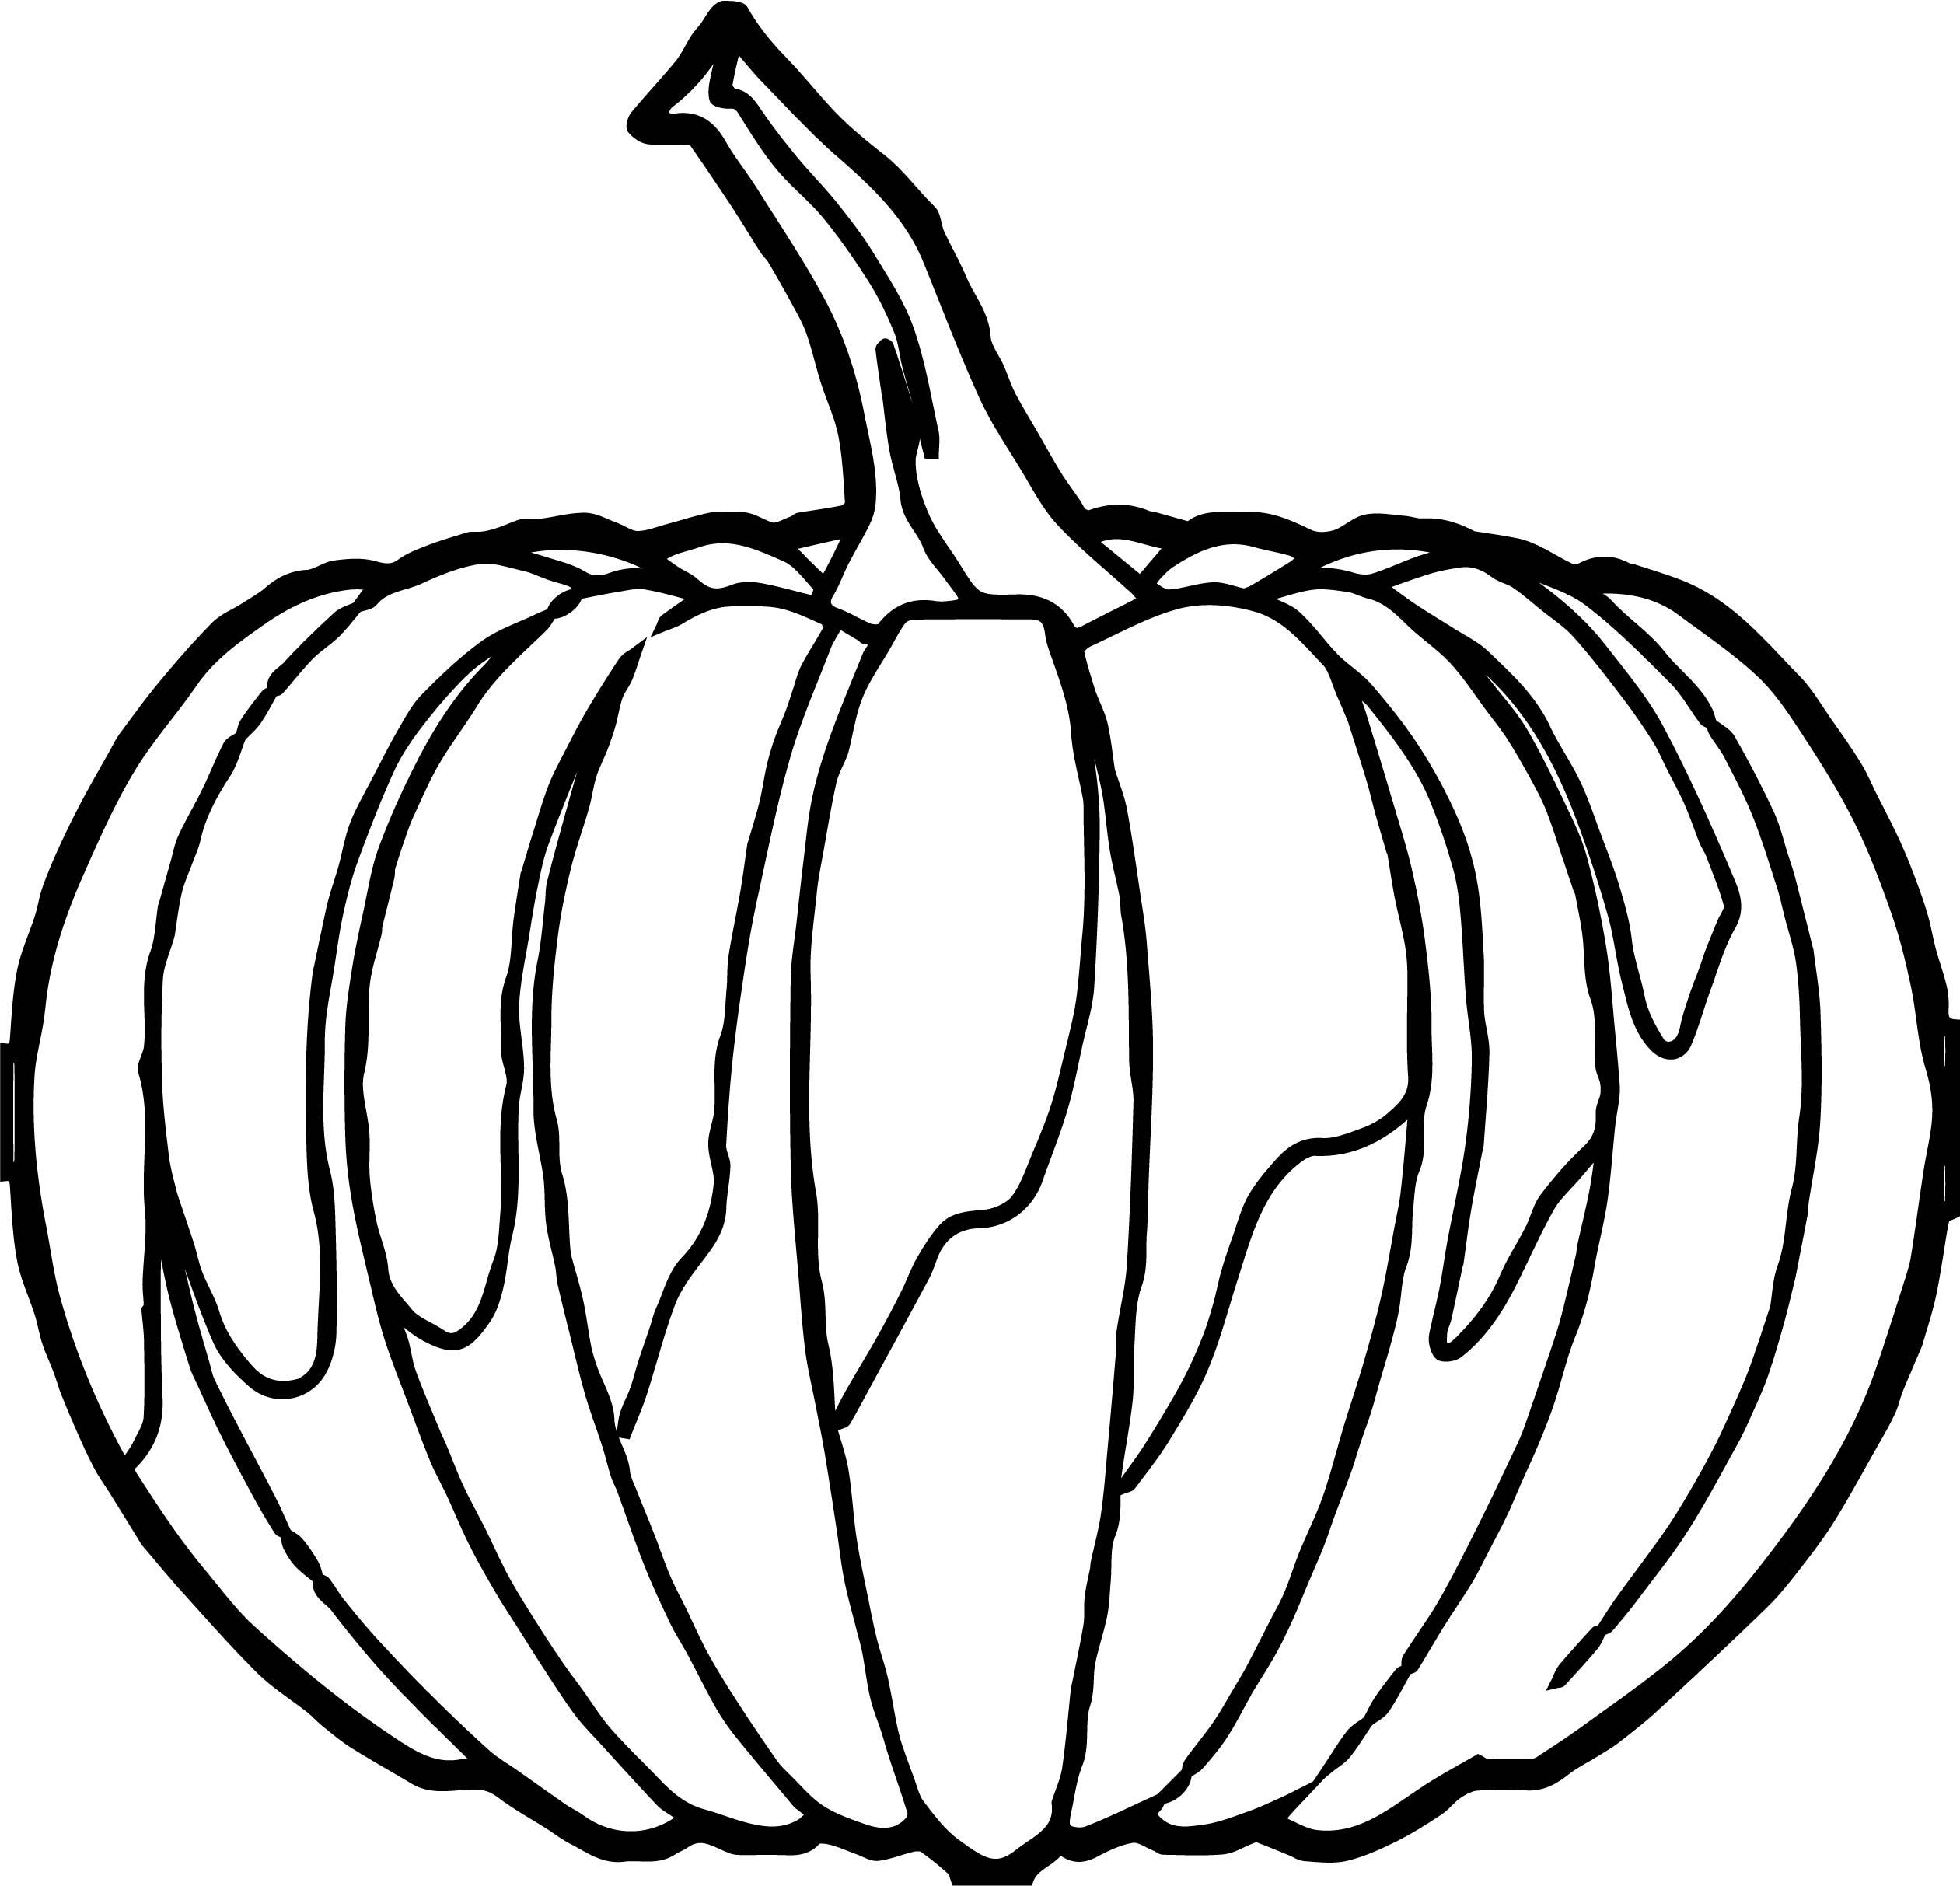 Any Pumpkin Coloring Page | Wecoloringpage.com